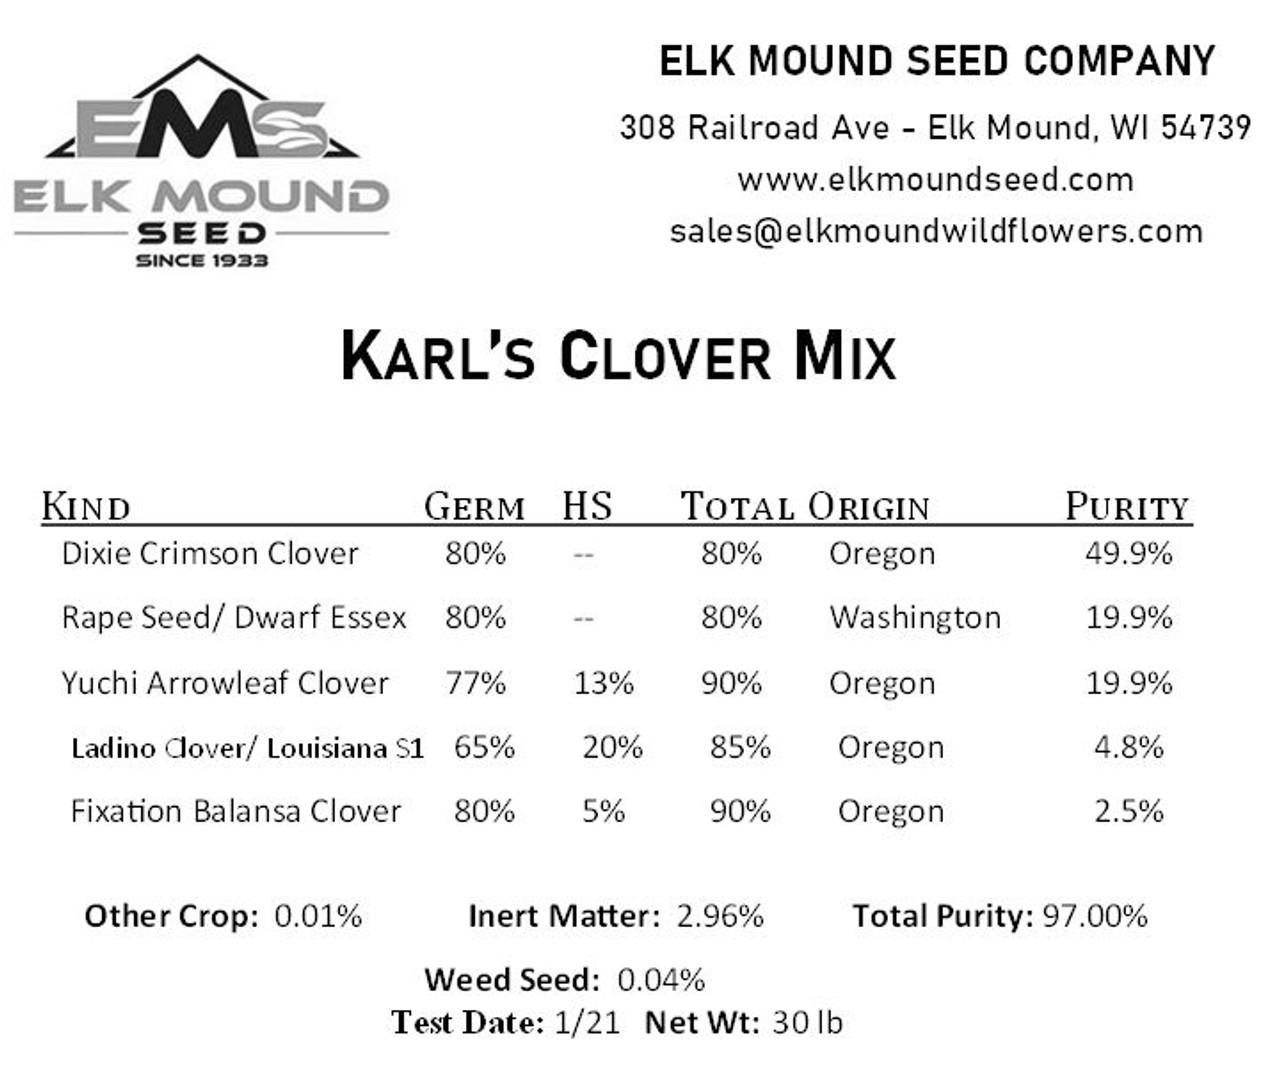 Karl's Clover Mix